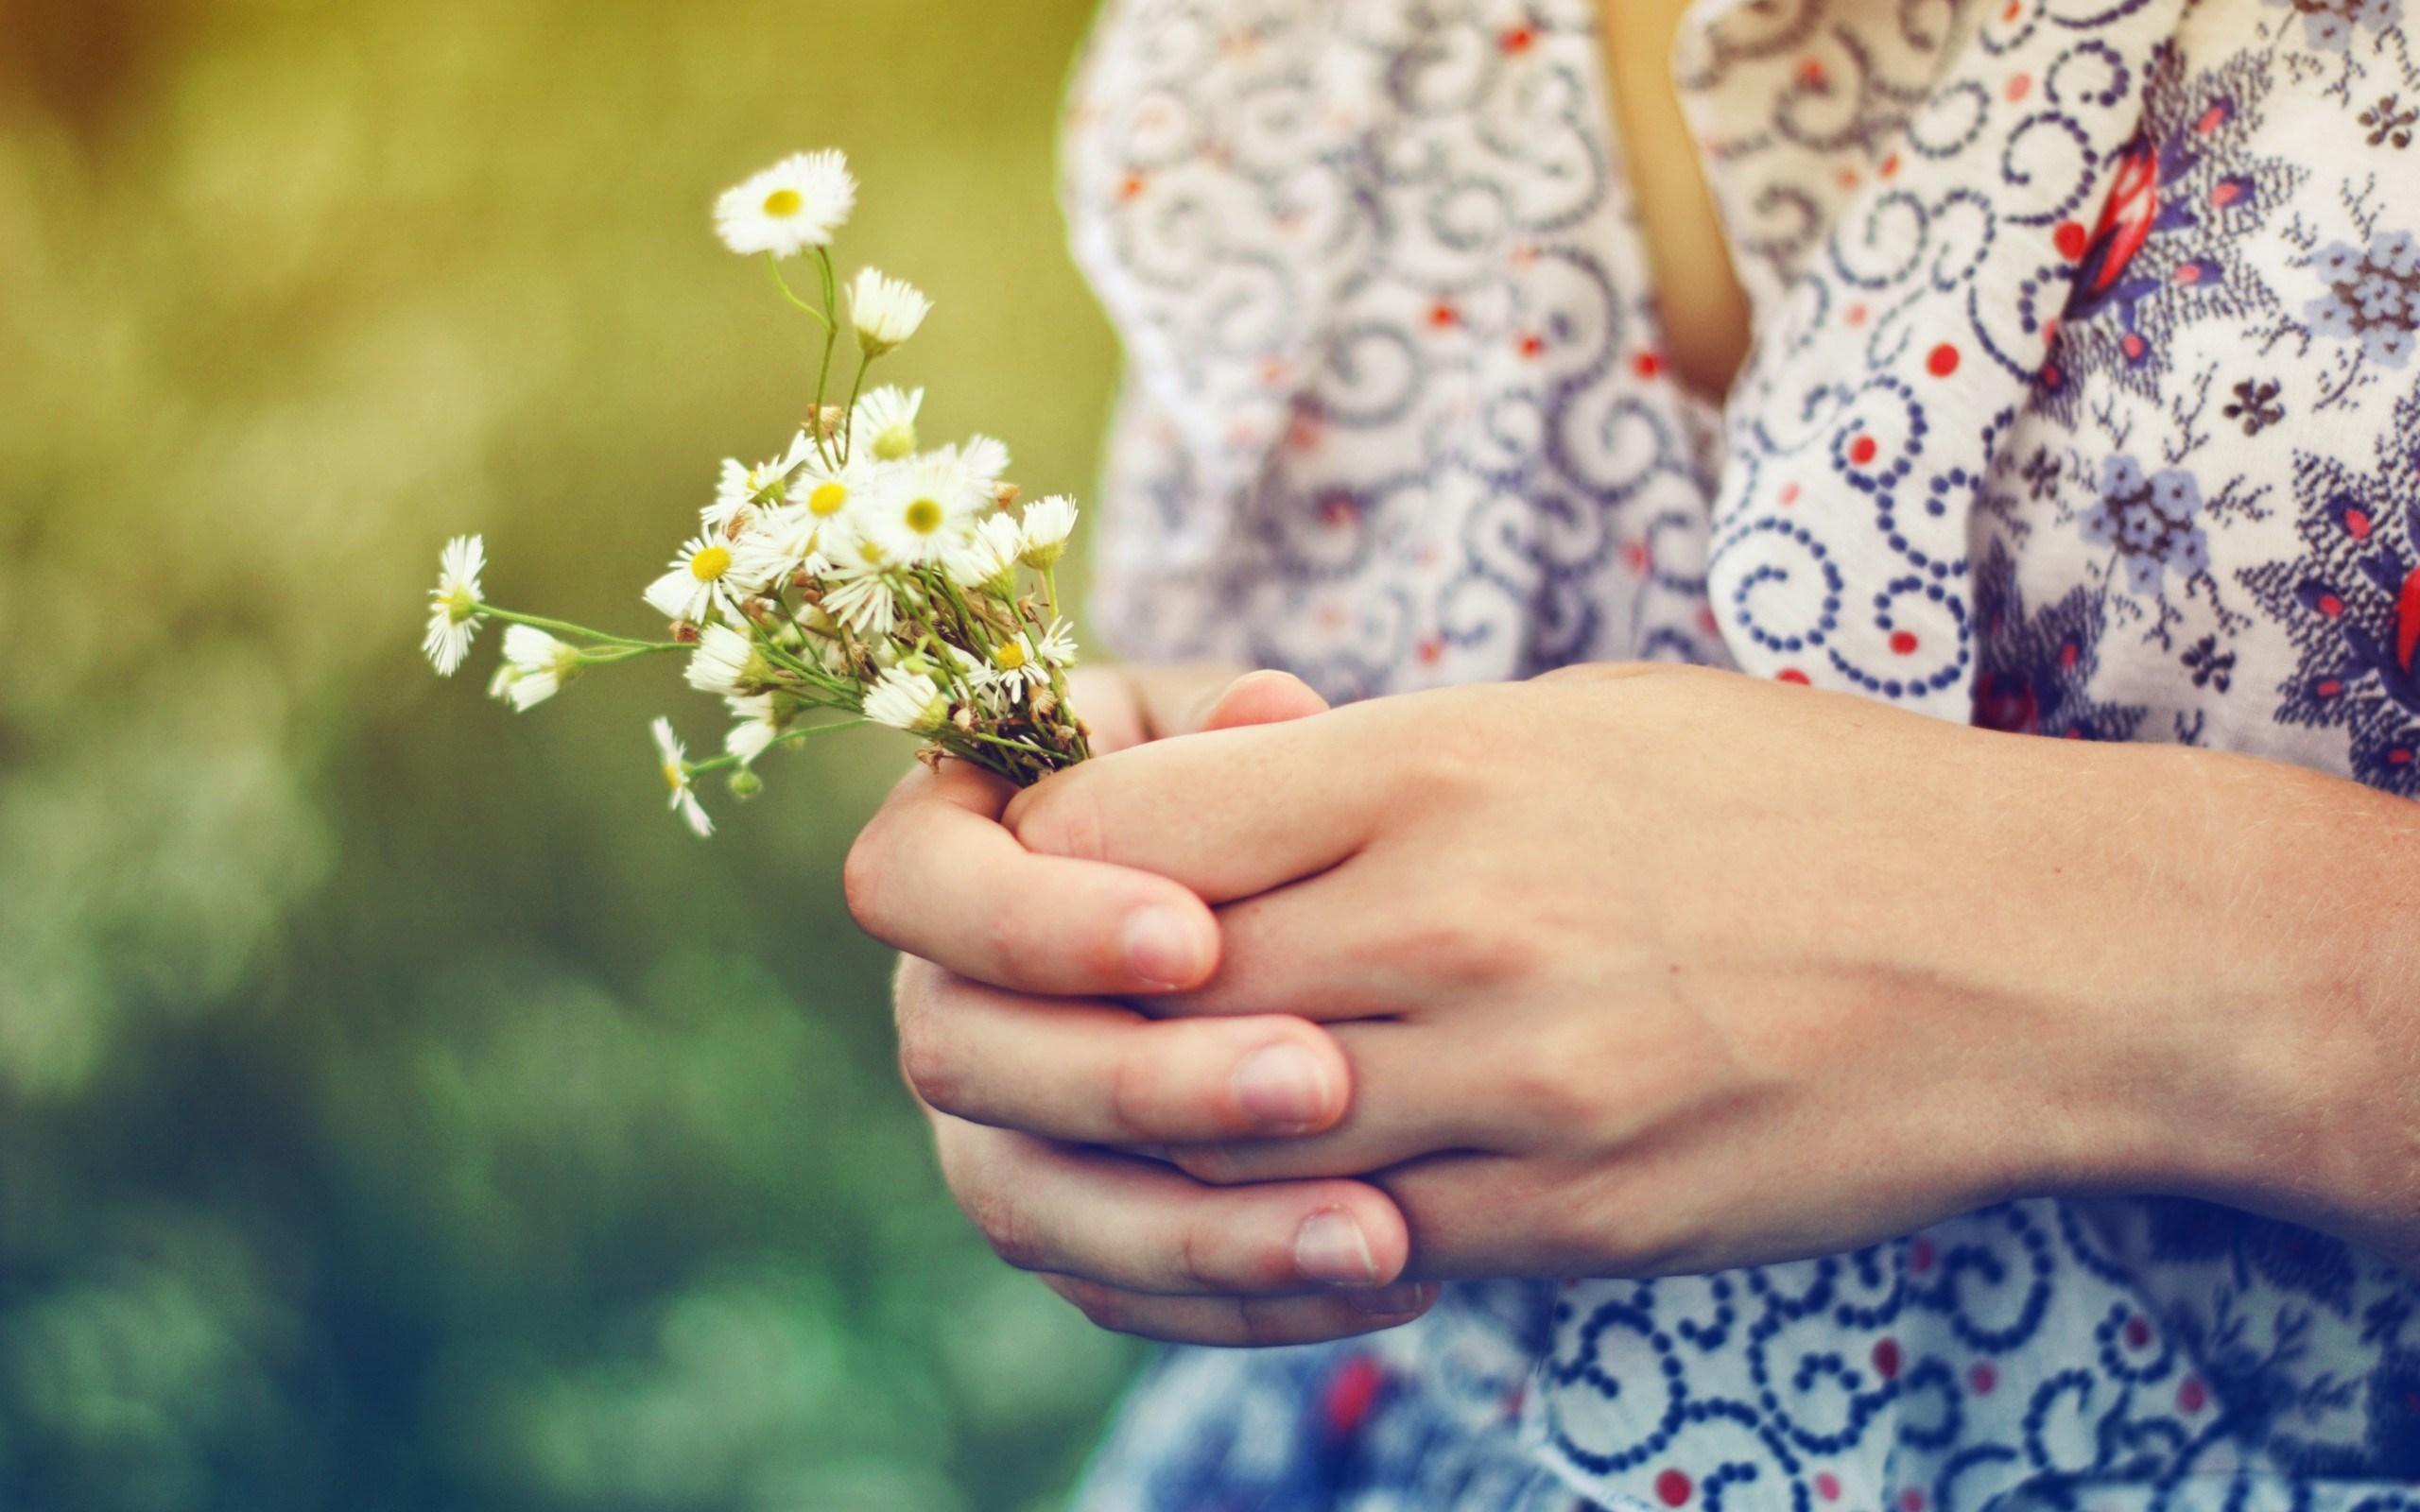 Mood Girl Hands Flowers